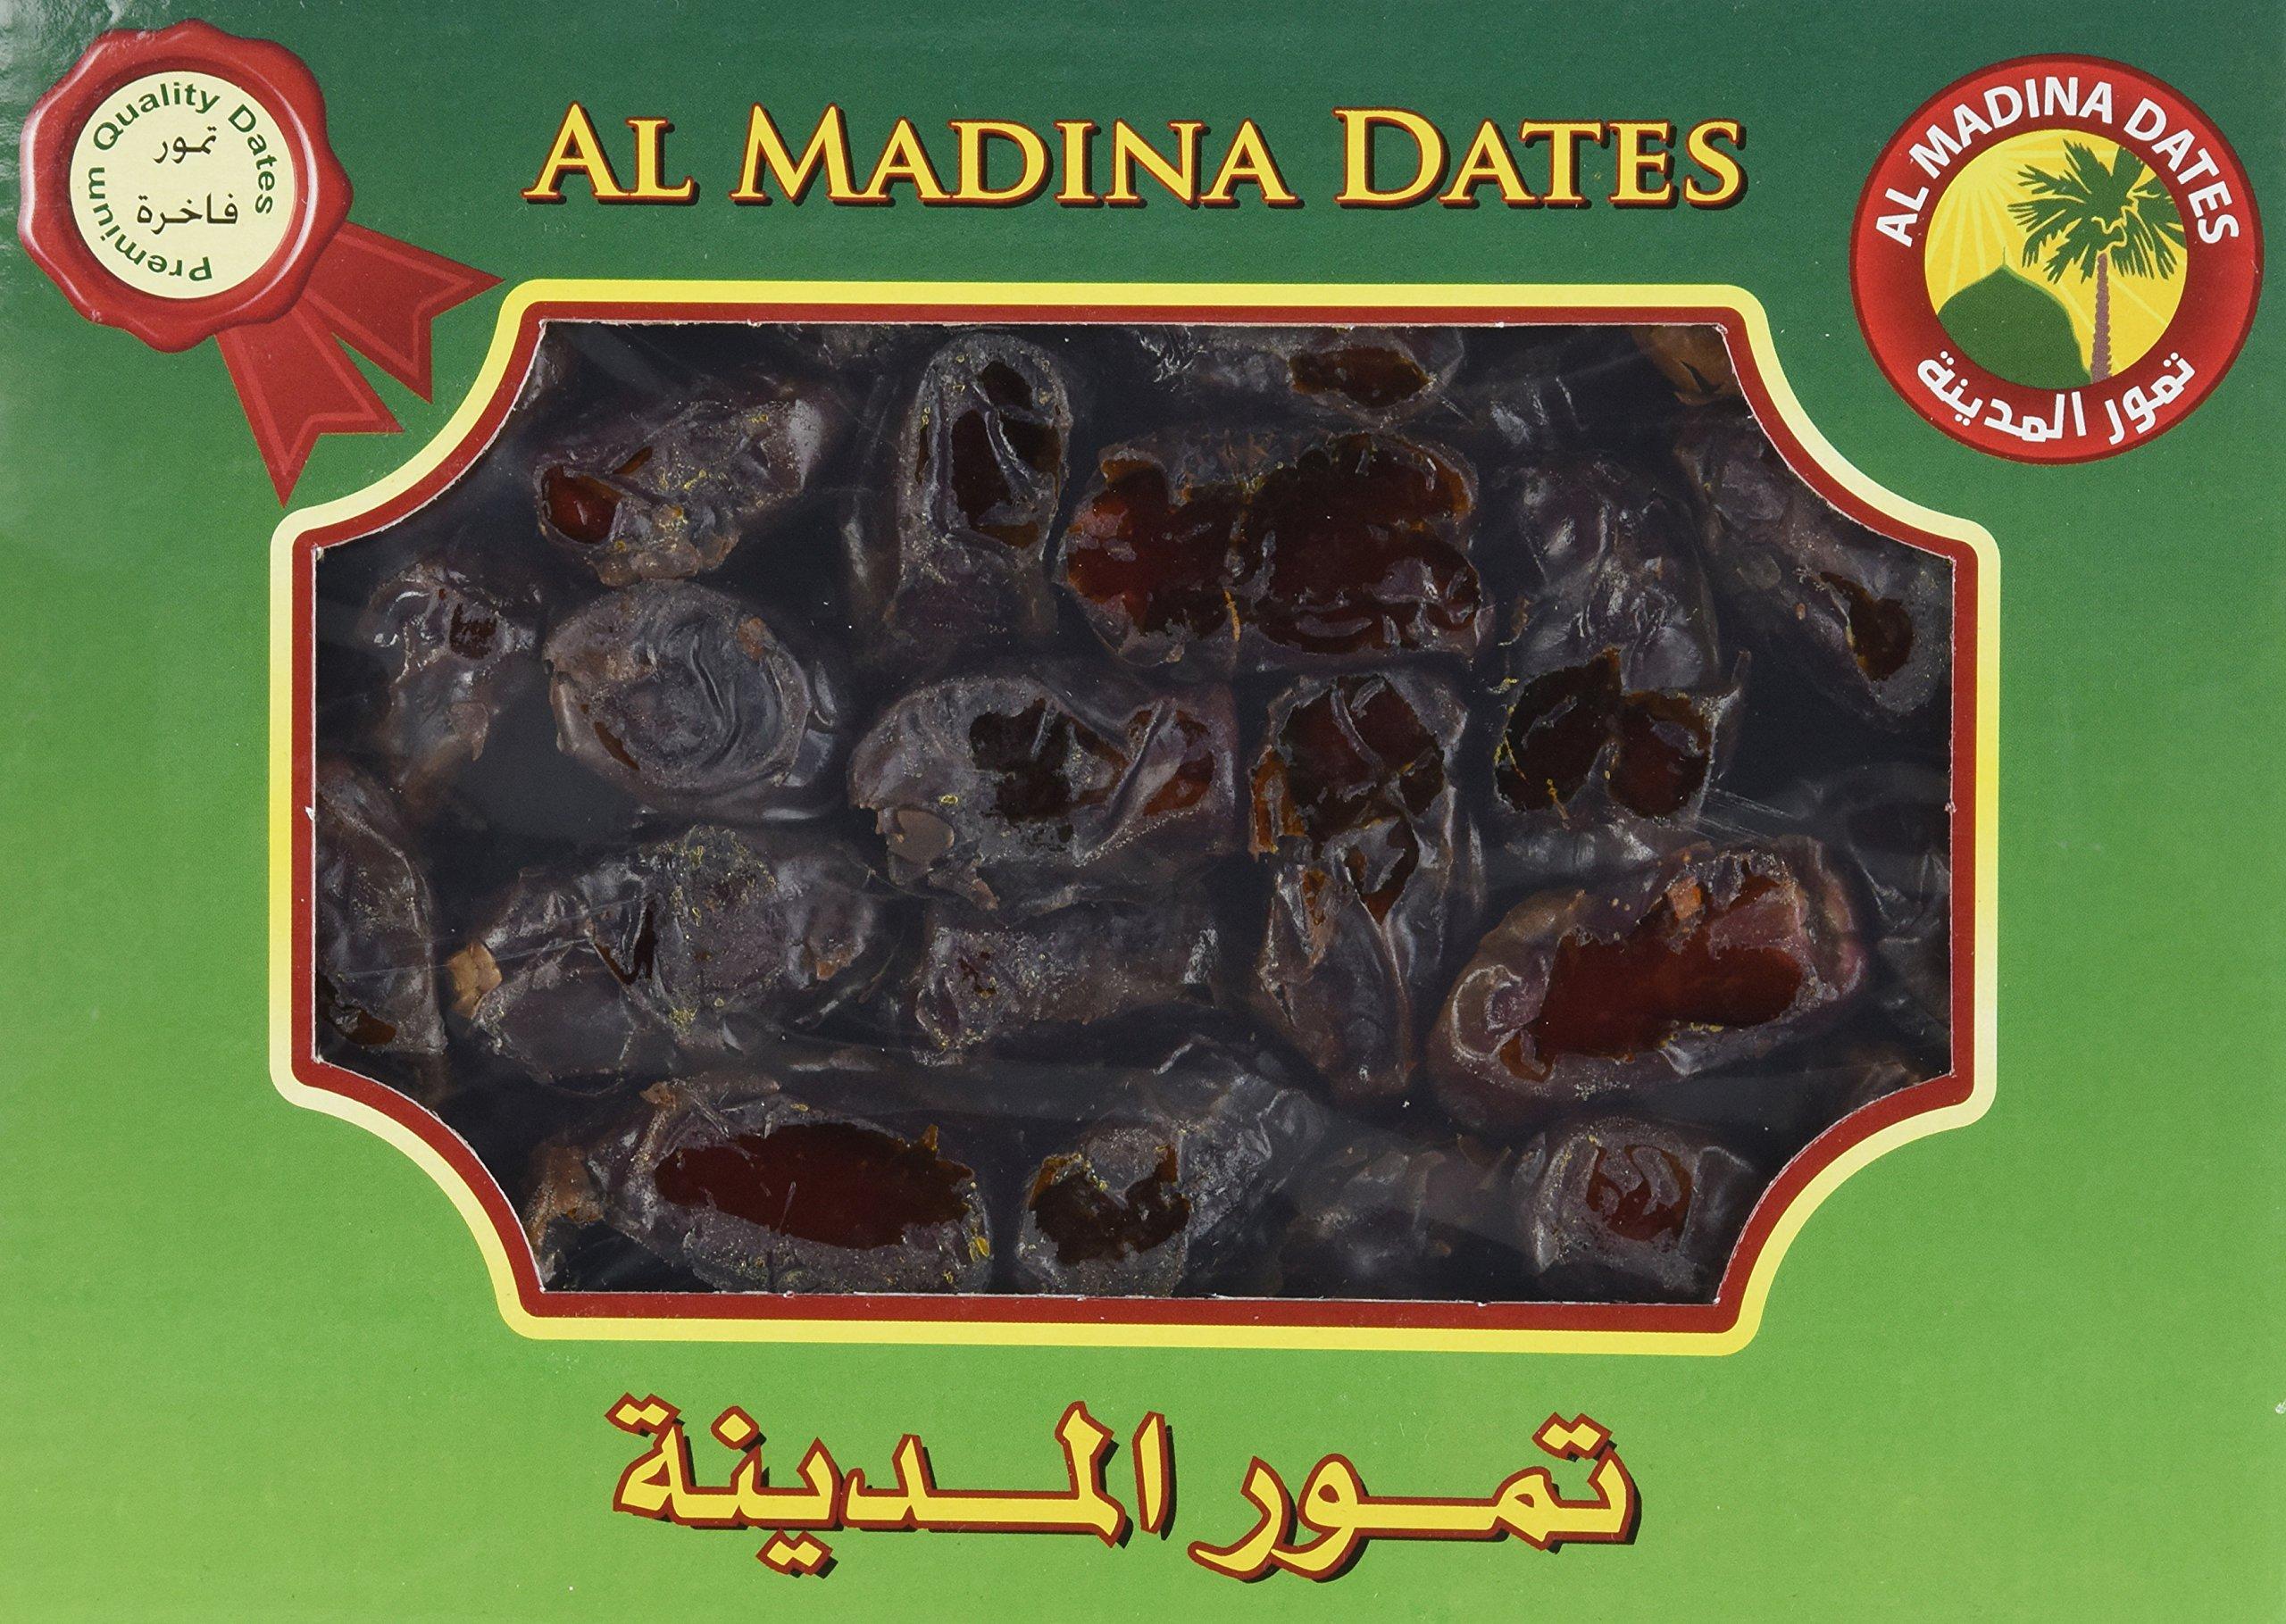 Al Madinah Premium Quality Dates 2lb - 907g